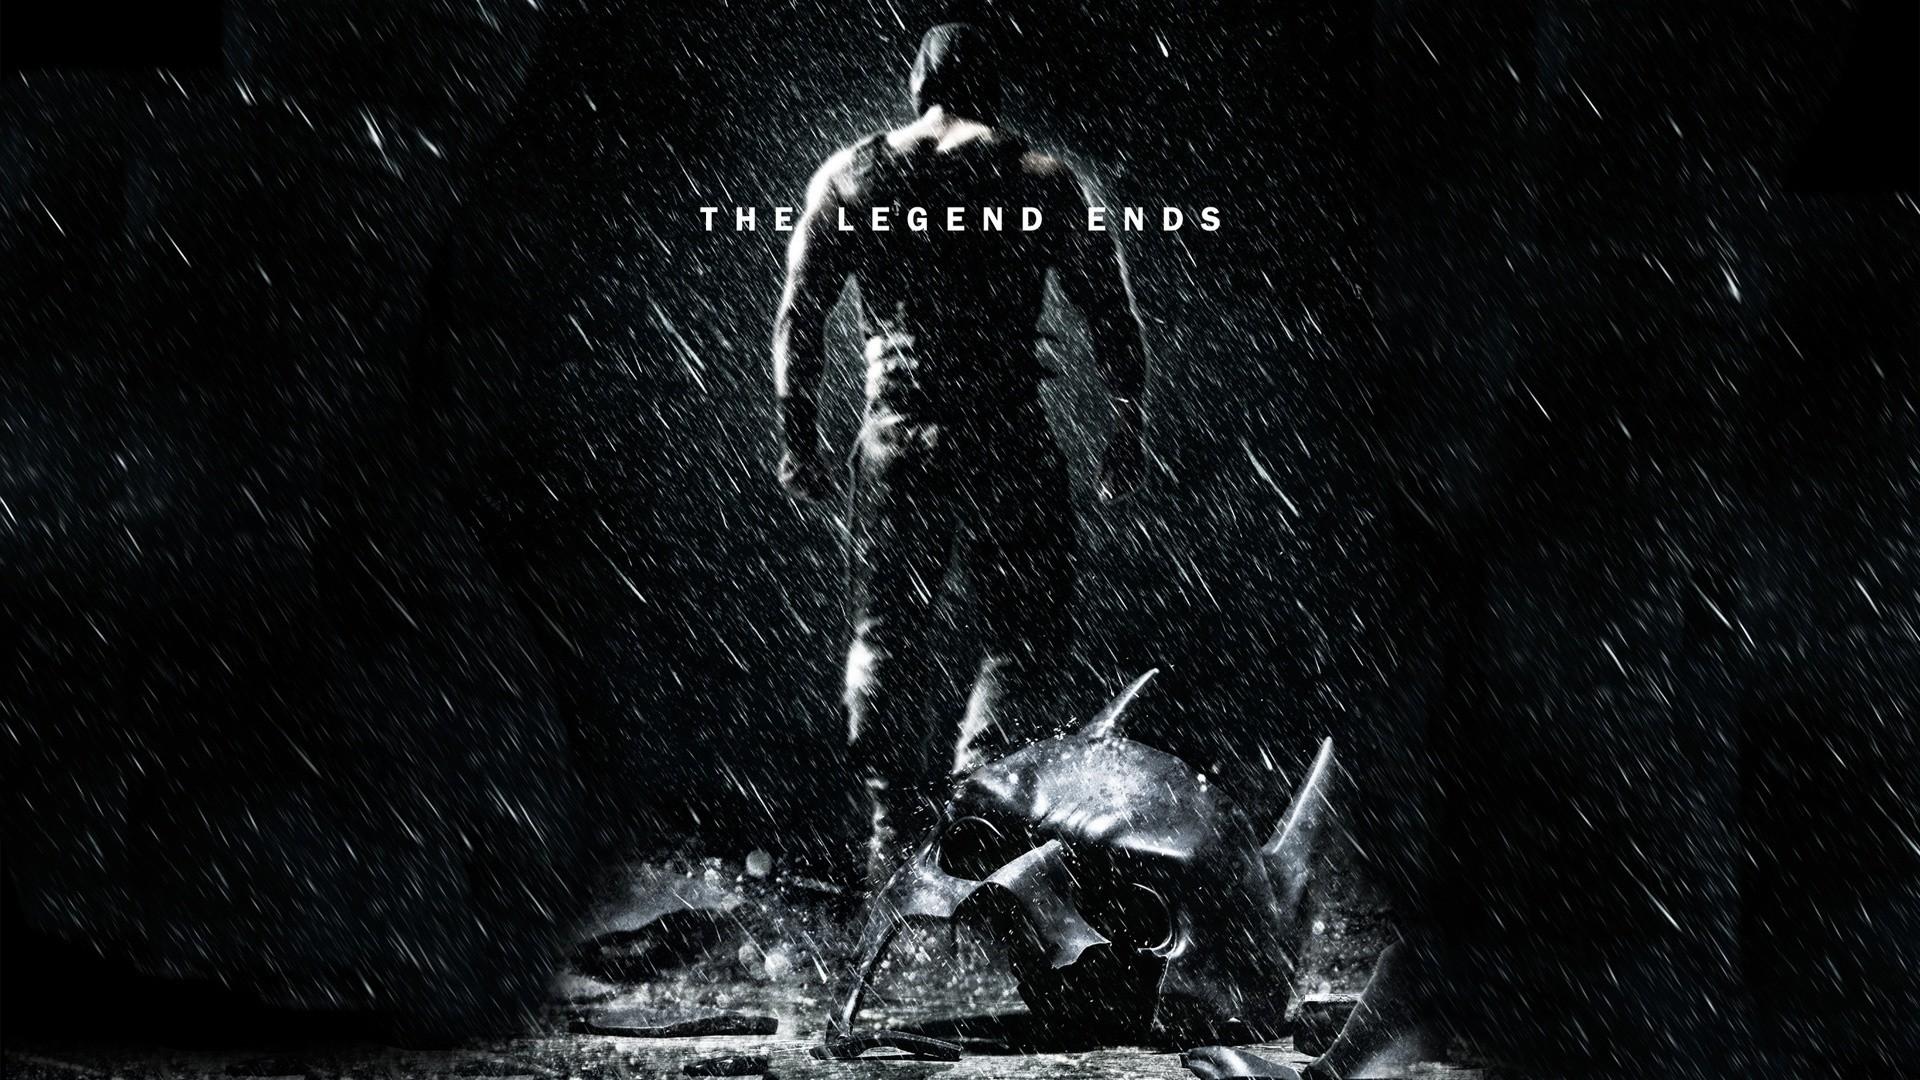 Workout Motivation Wallpaper Hd The Dark Knight Rises Wallpaper Hd 1920x1080 183 ①